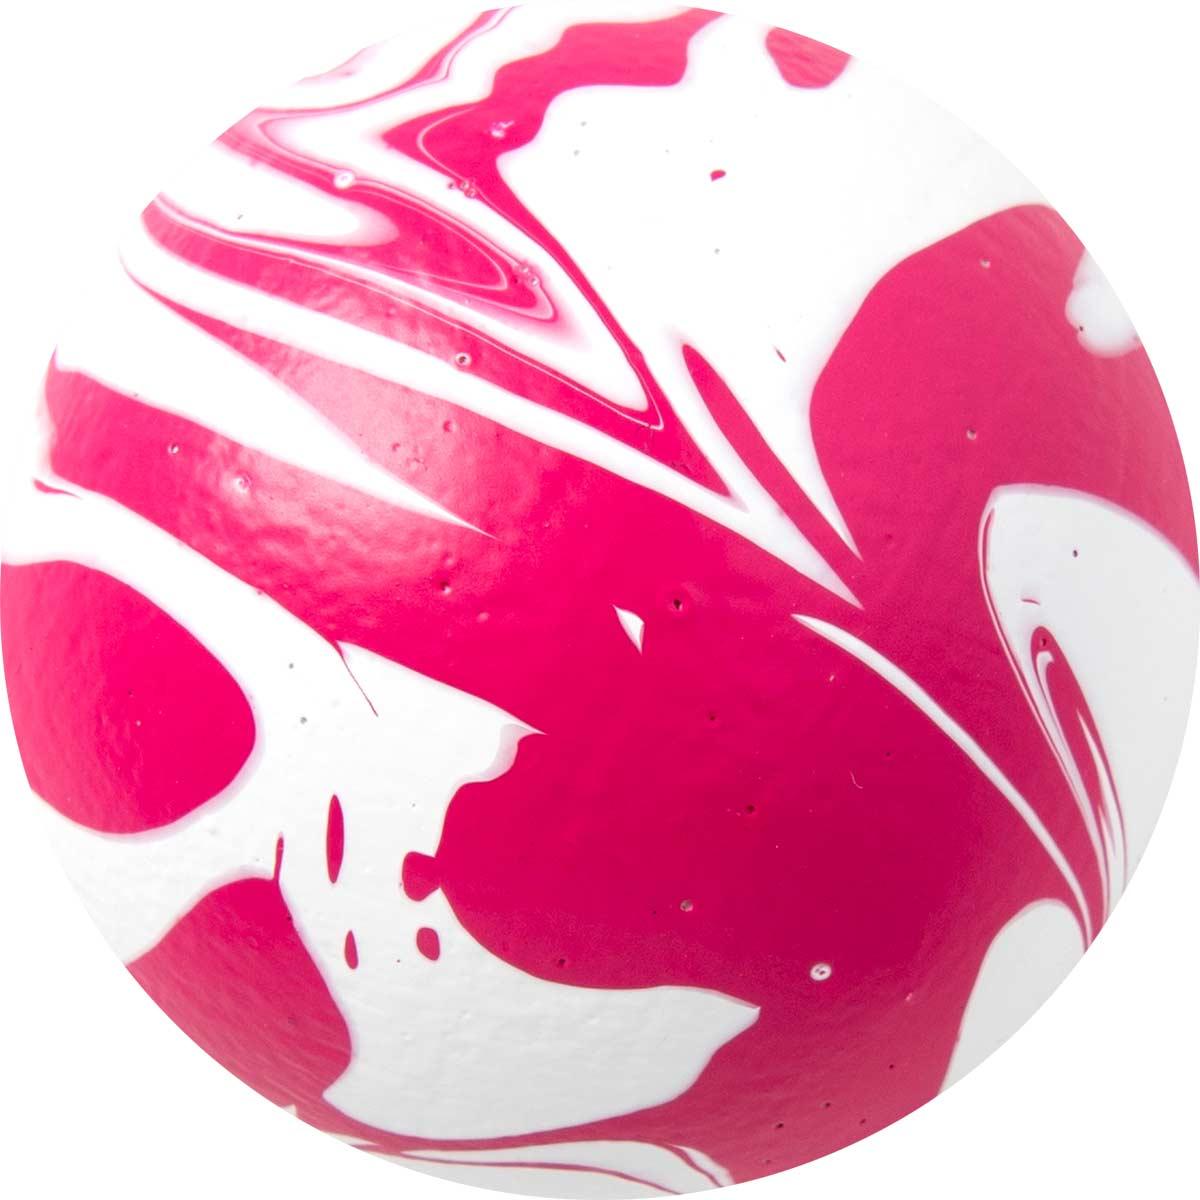 FolkArt ® Marbling Paint - Hot Pink, 2 oz.